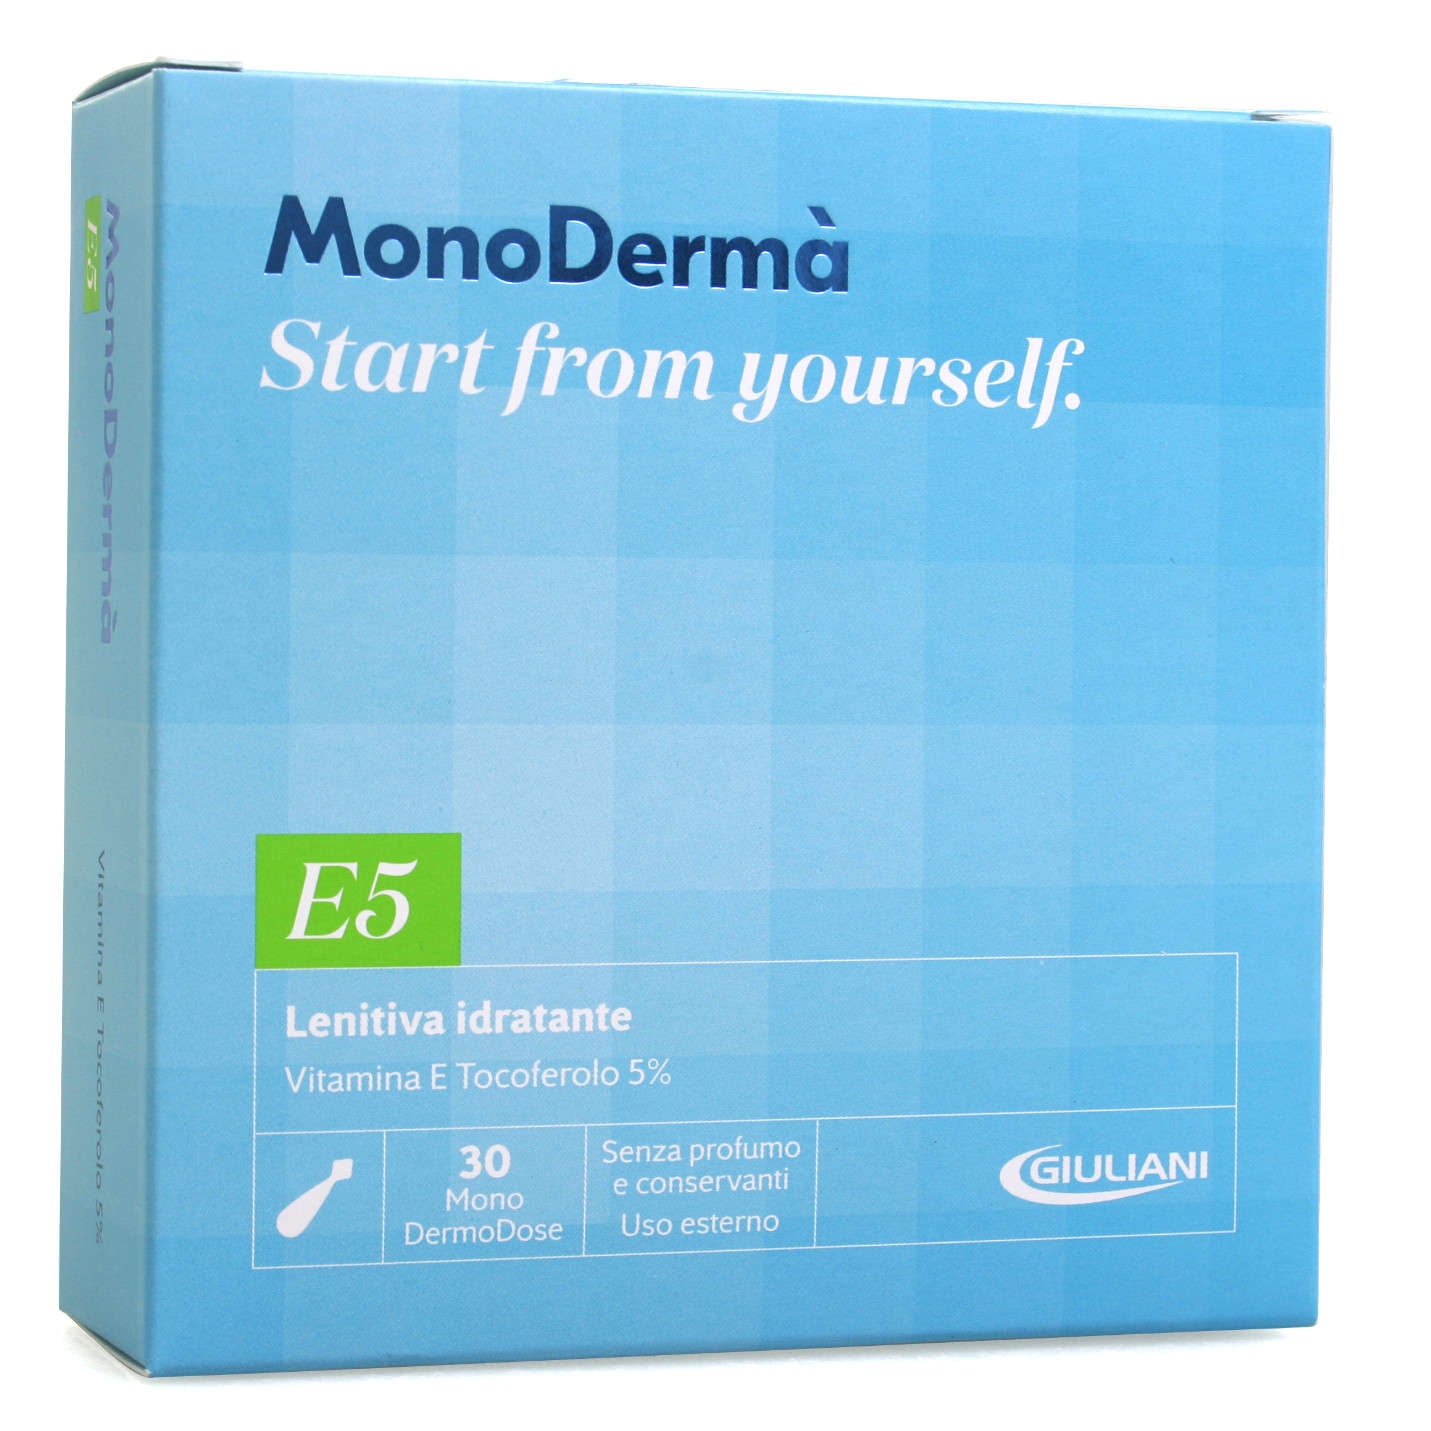 Monoderma' - E5 - 28 Dermodosi